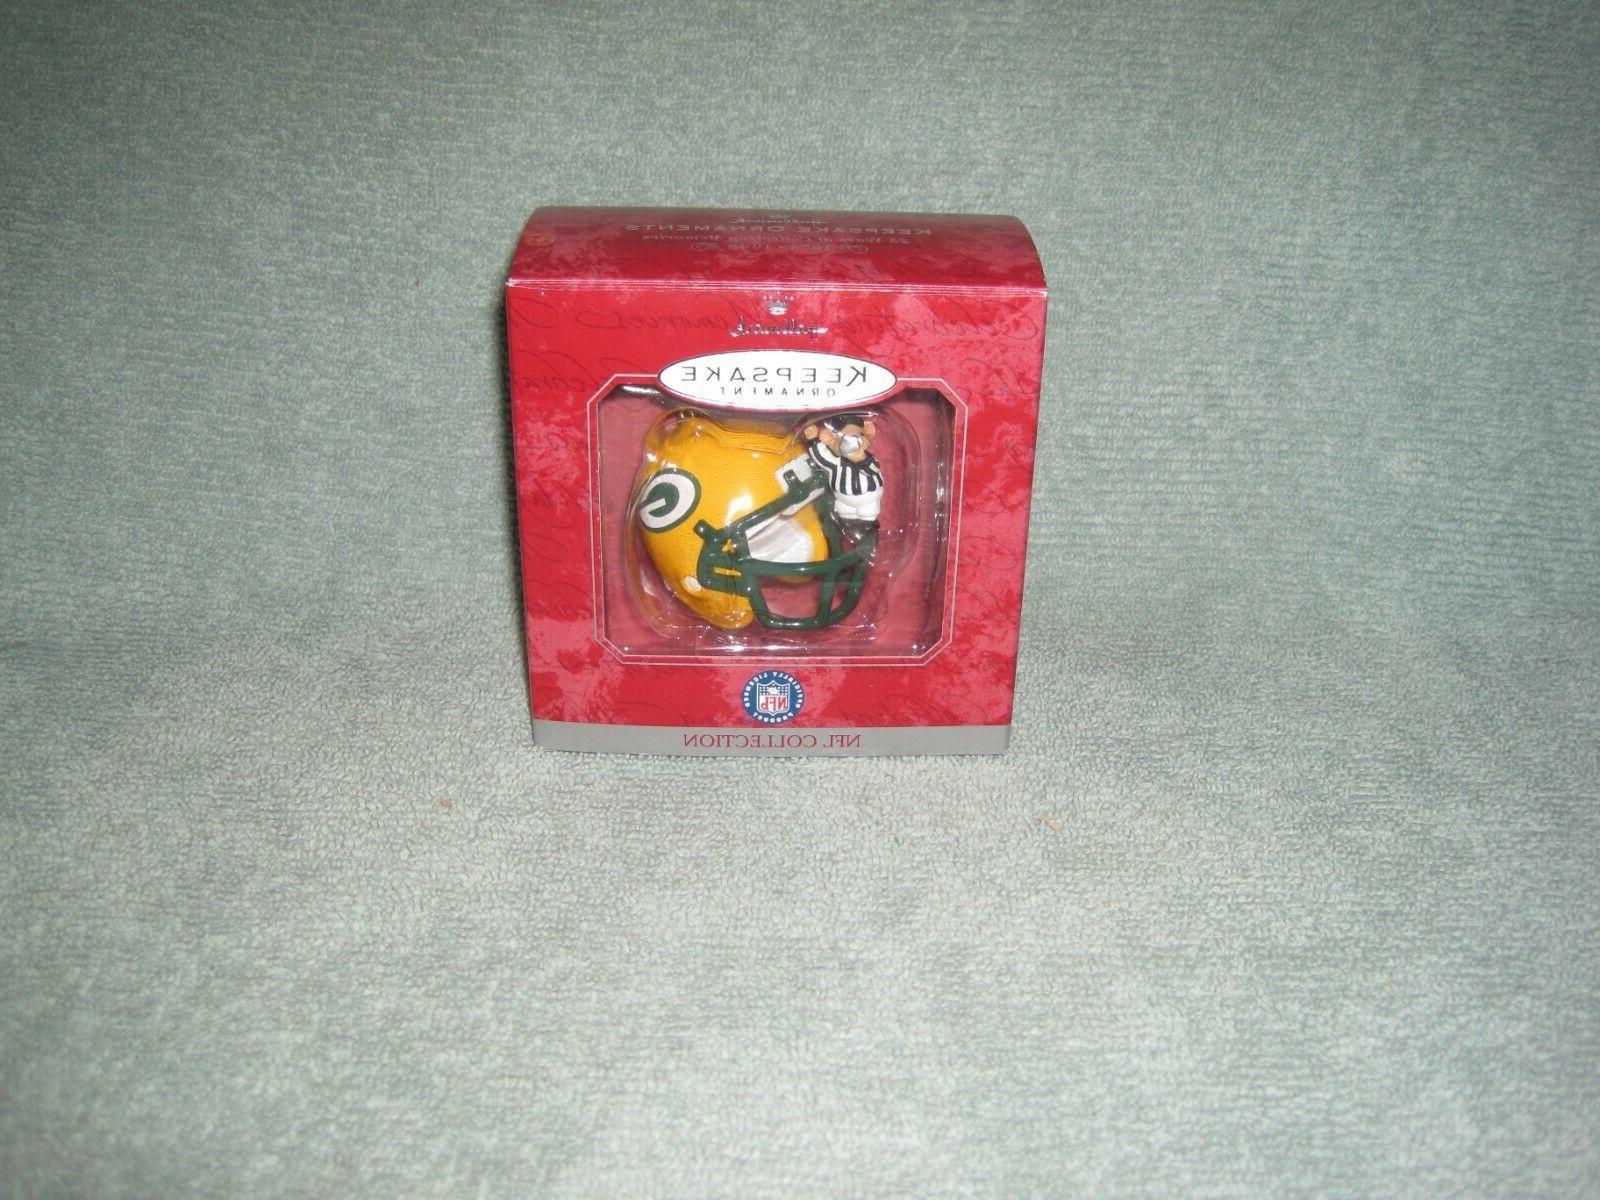 Hallmark Keepsake Bay Packers Ornament w/ Referee